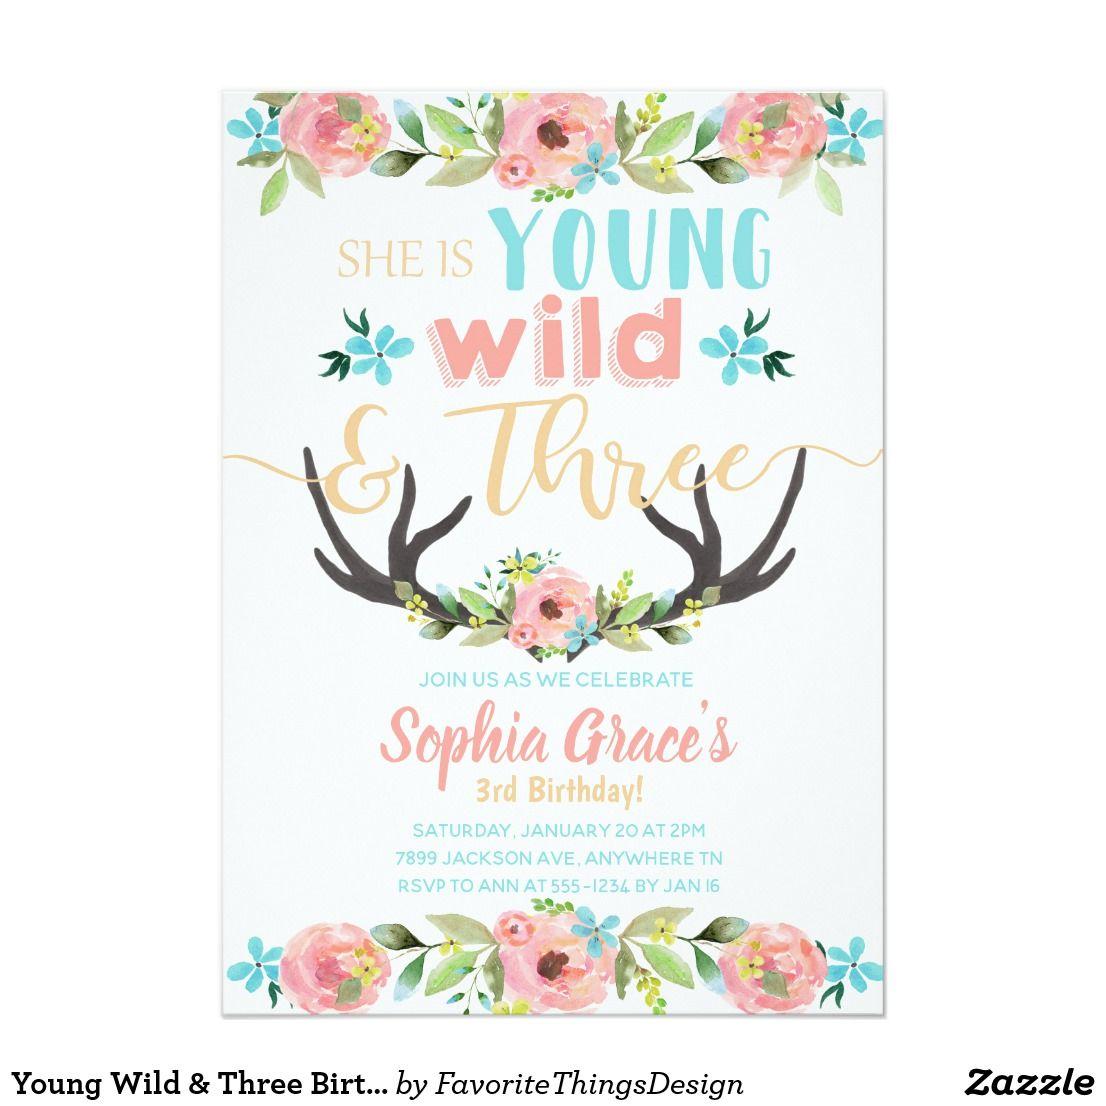 Young Wild & Three Birthday Invitation   Young Wild & Three ...